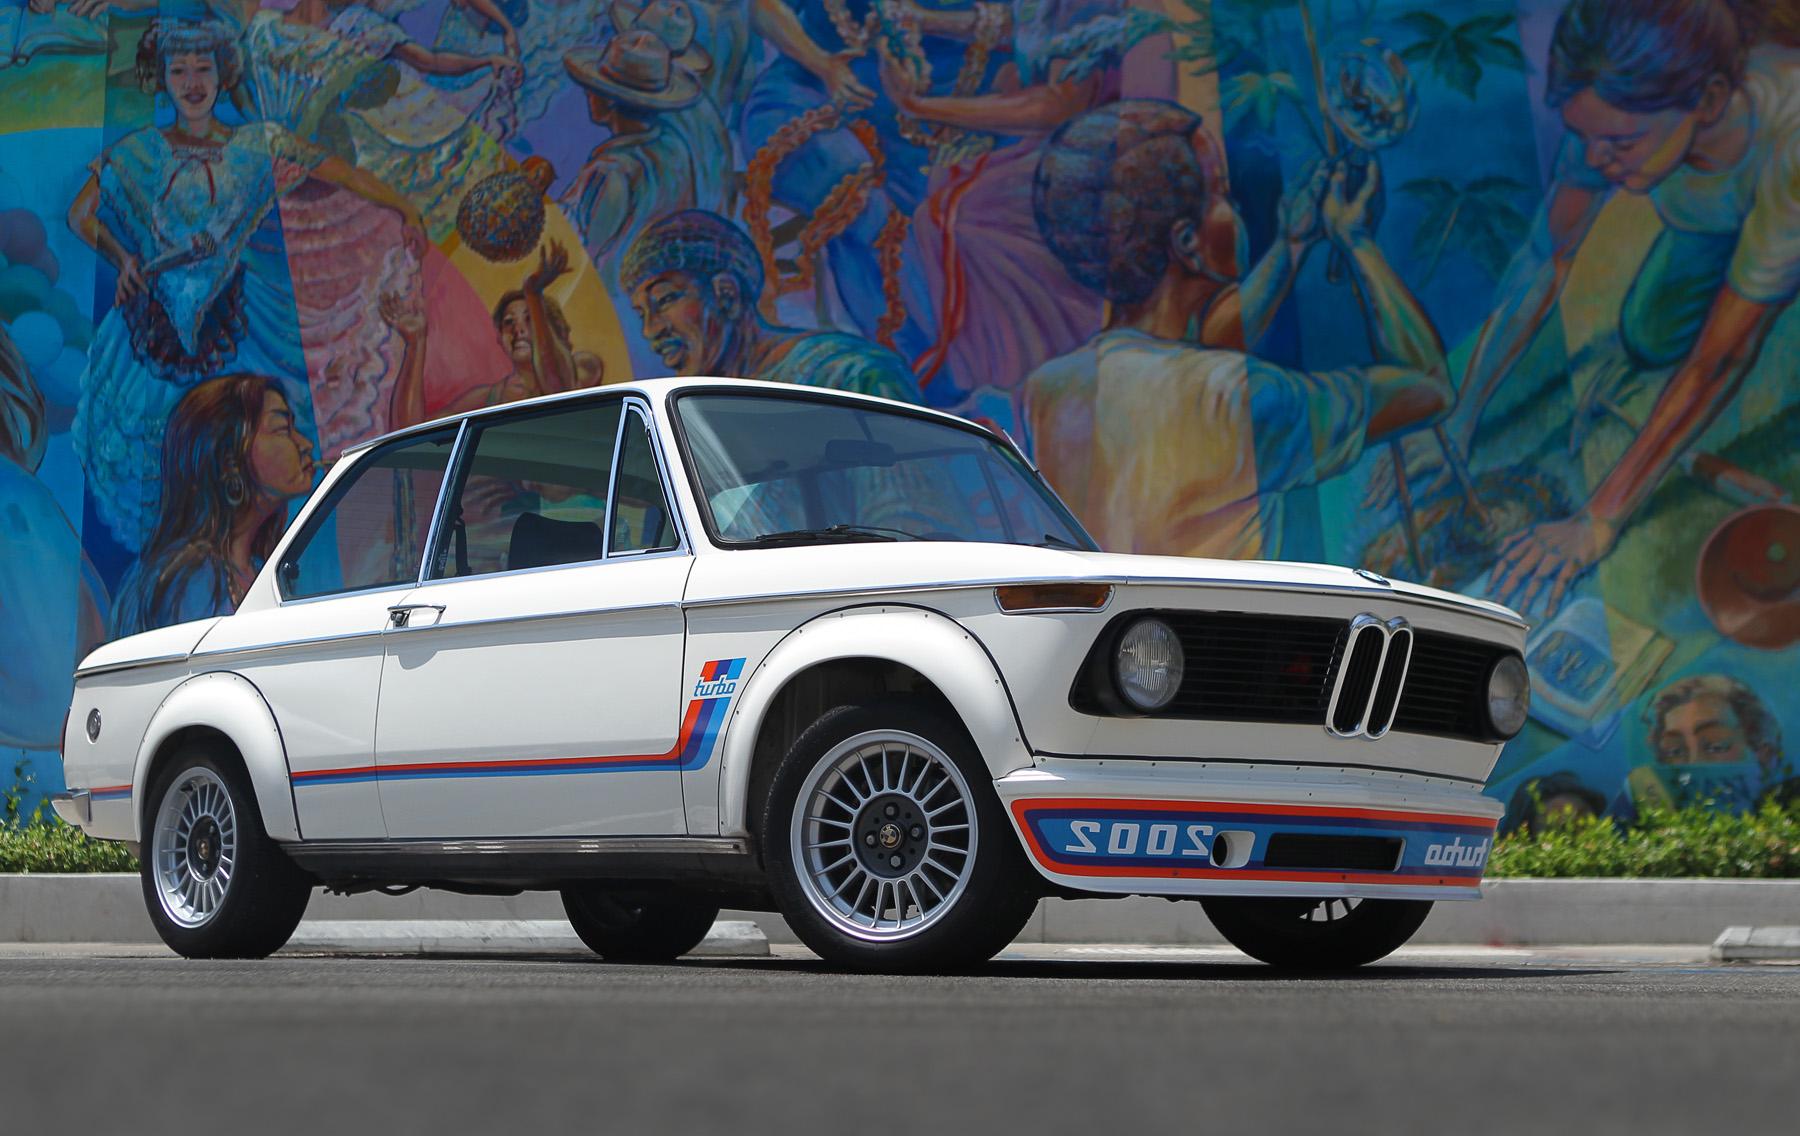 On the block: 1974 BMW 2002 Turbo (Estimate: $60,000 - $80,000). Image courtesy Gooding & Company/Mathieu Heurtault